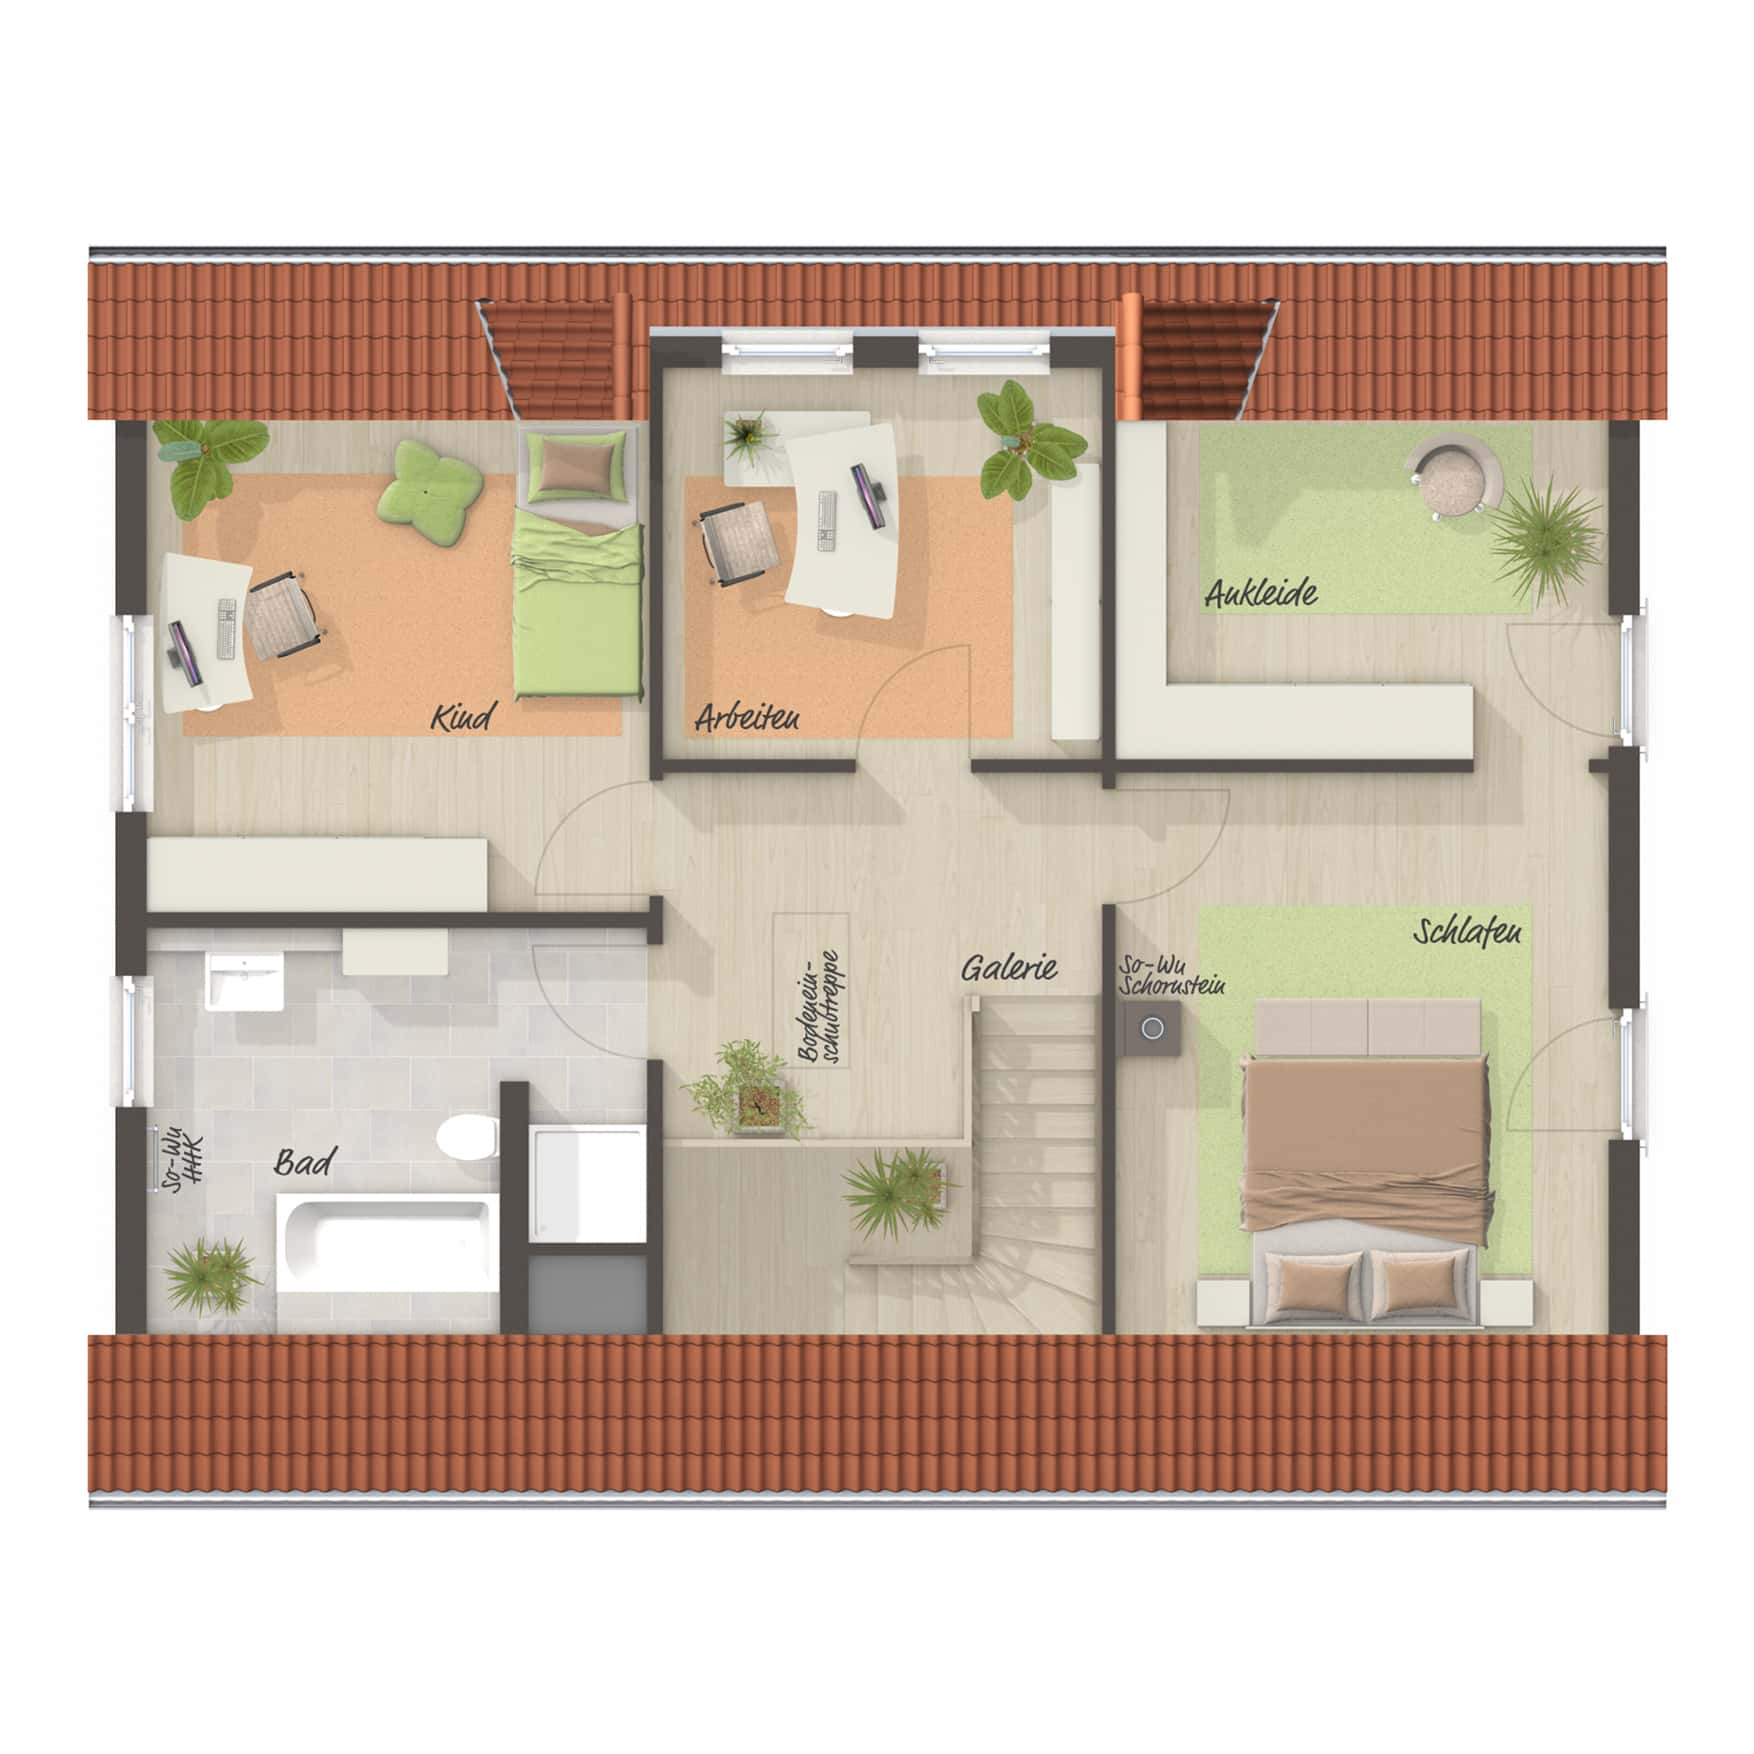 Grundriss Einfamilienhaus Obergeschoss mit Satteldach, 5 Zimmer, 145 qm - Town Country Haus Massivhaus Landhaus 142 - HausbauDirekt.de